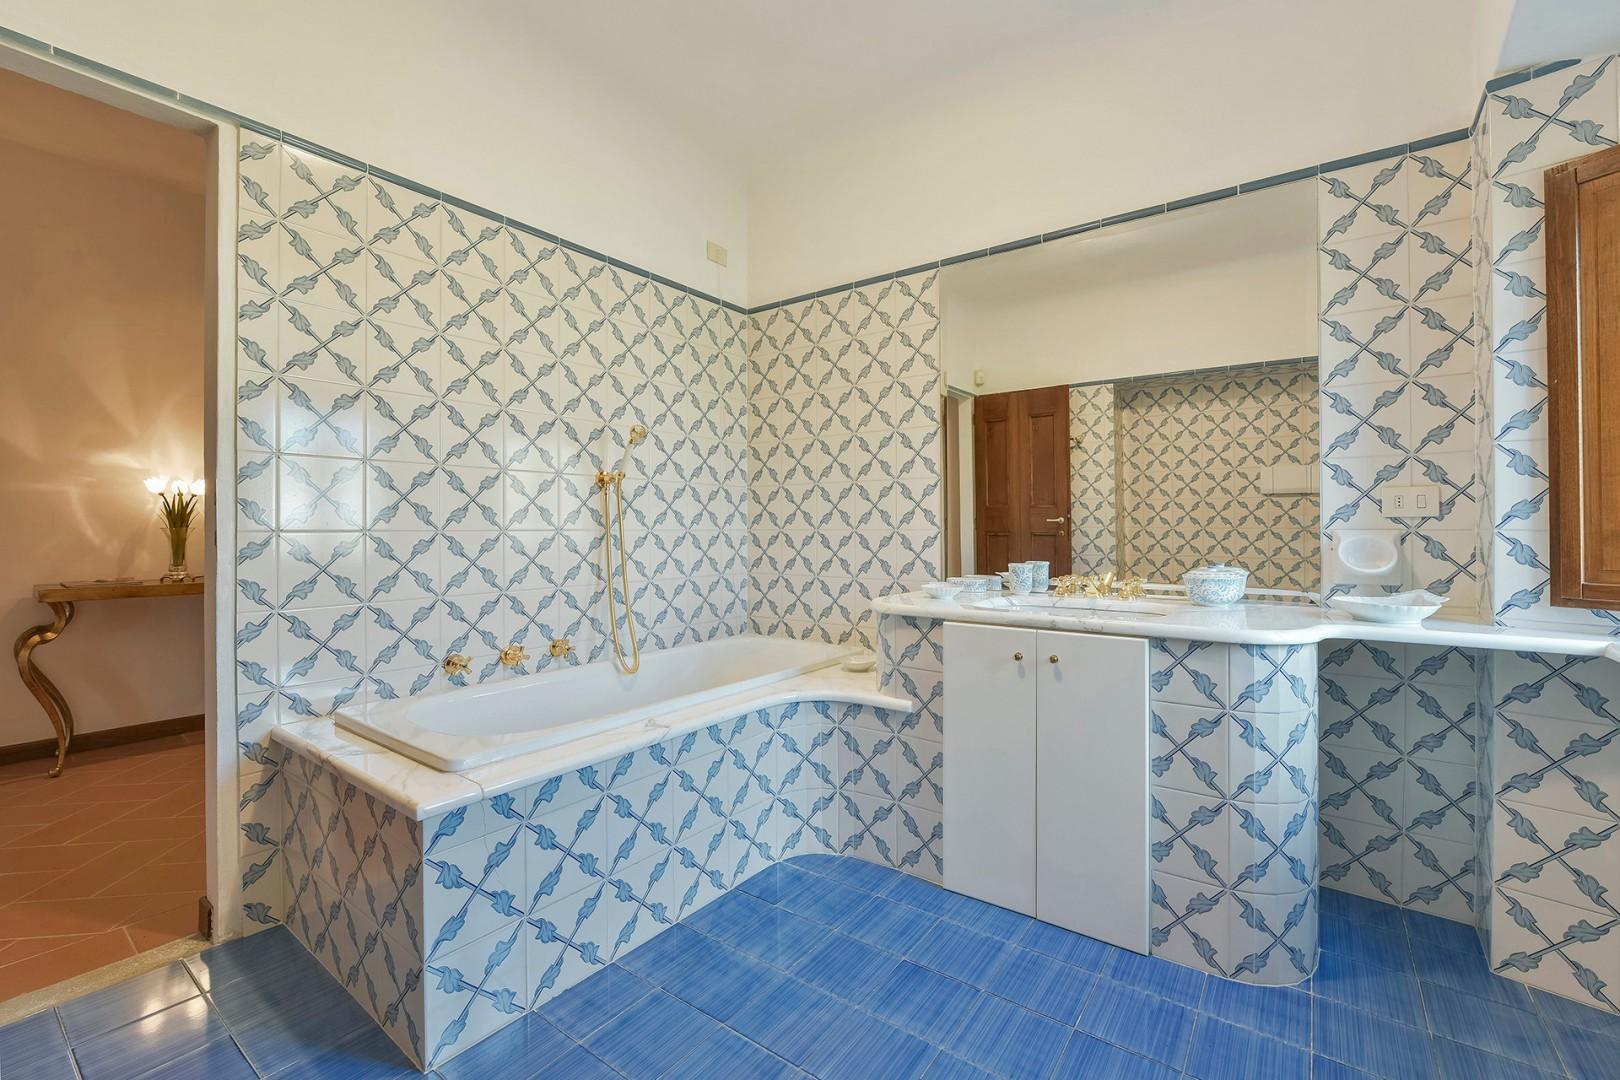 Bathroom 1 has a bathtub with handheld showerhead.